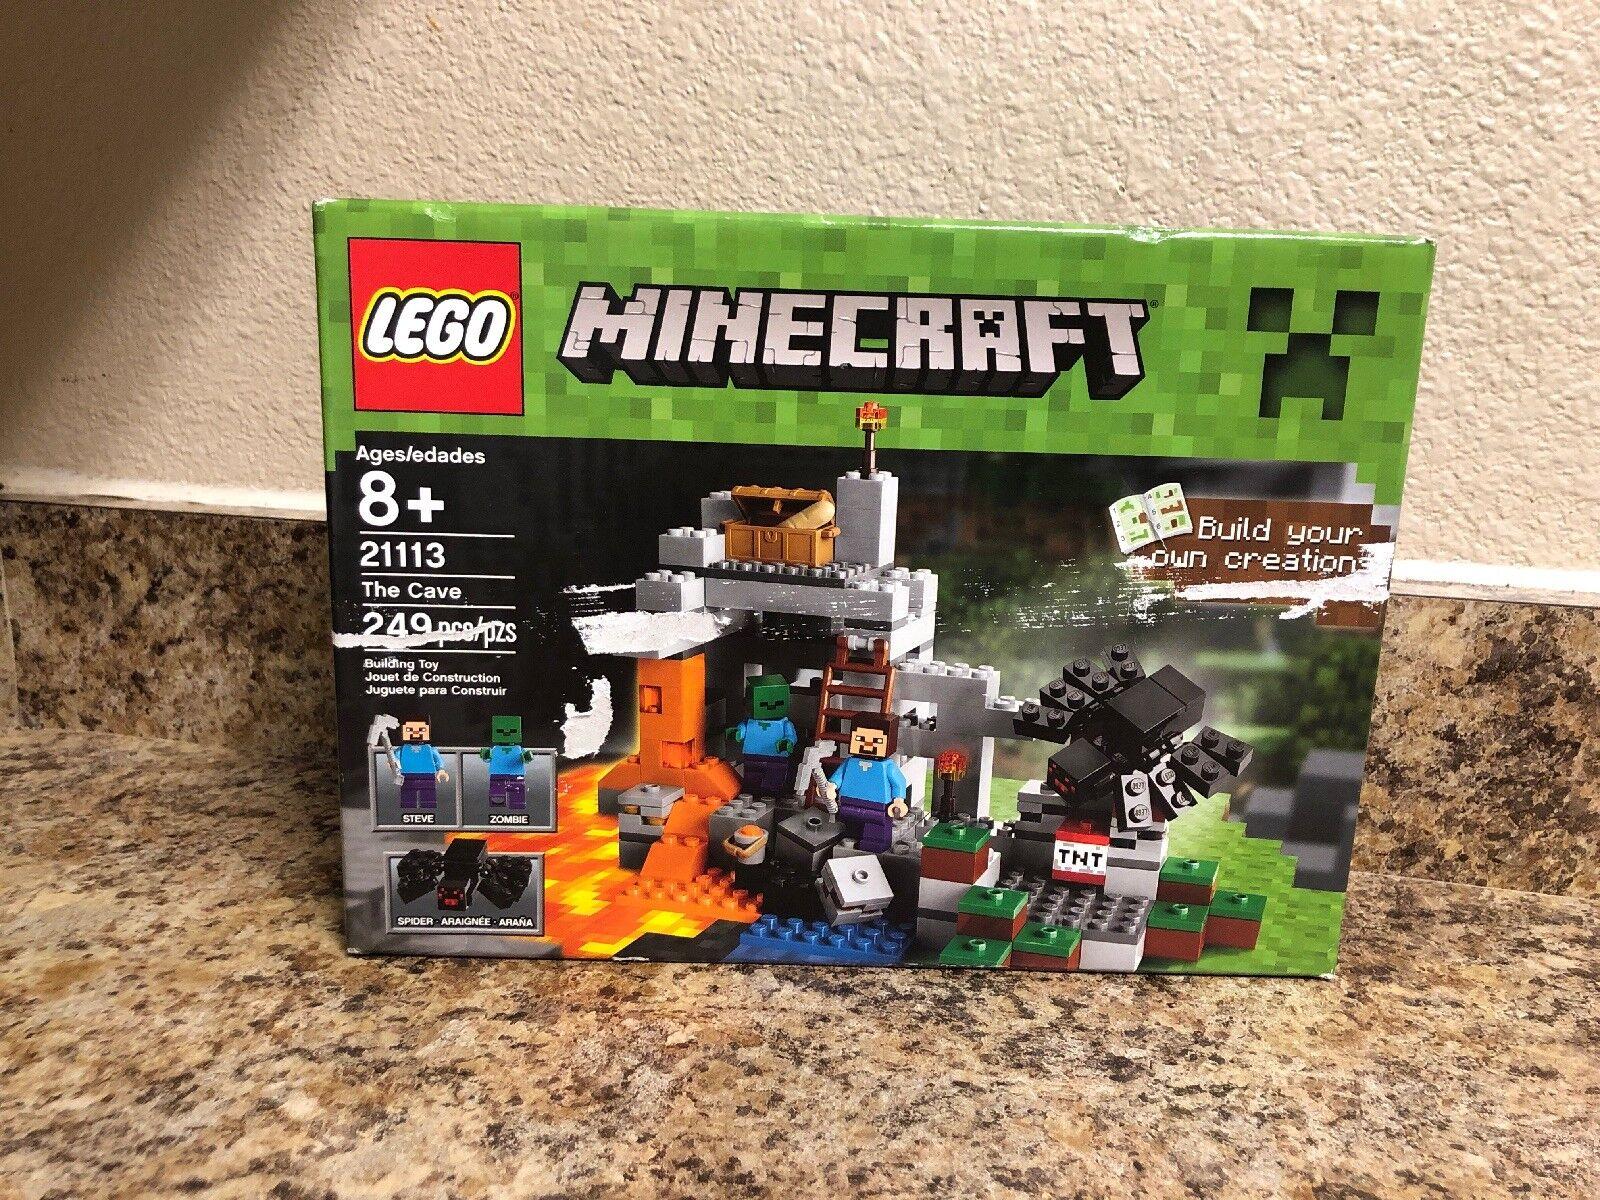 Lego Minecraft The Cave 21113 Classic Creative Supplement Big Lego Set Crafting